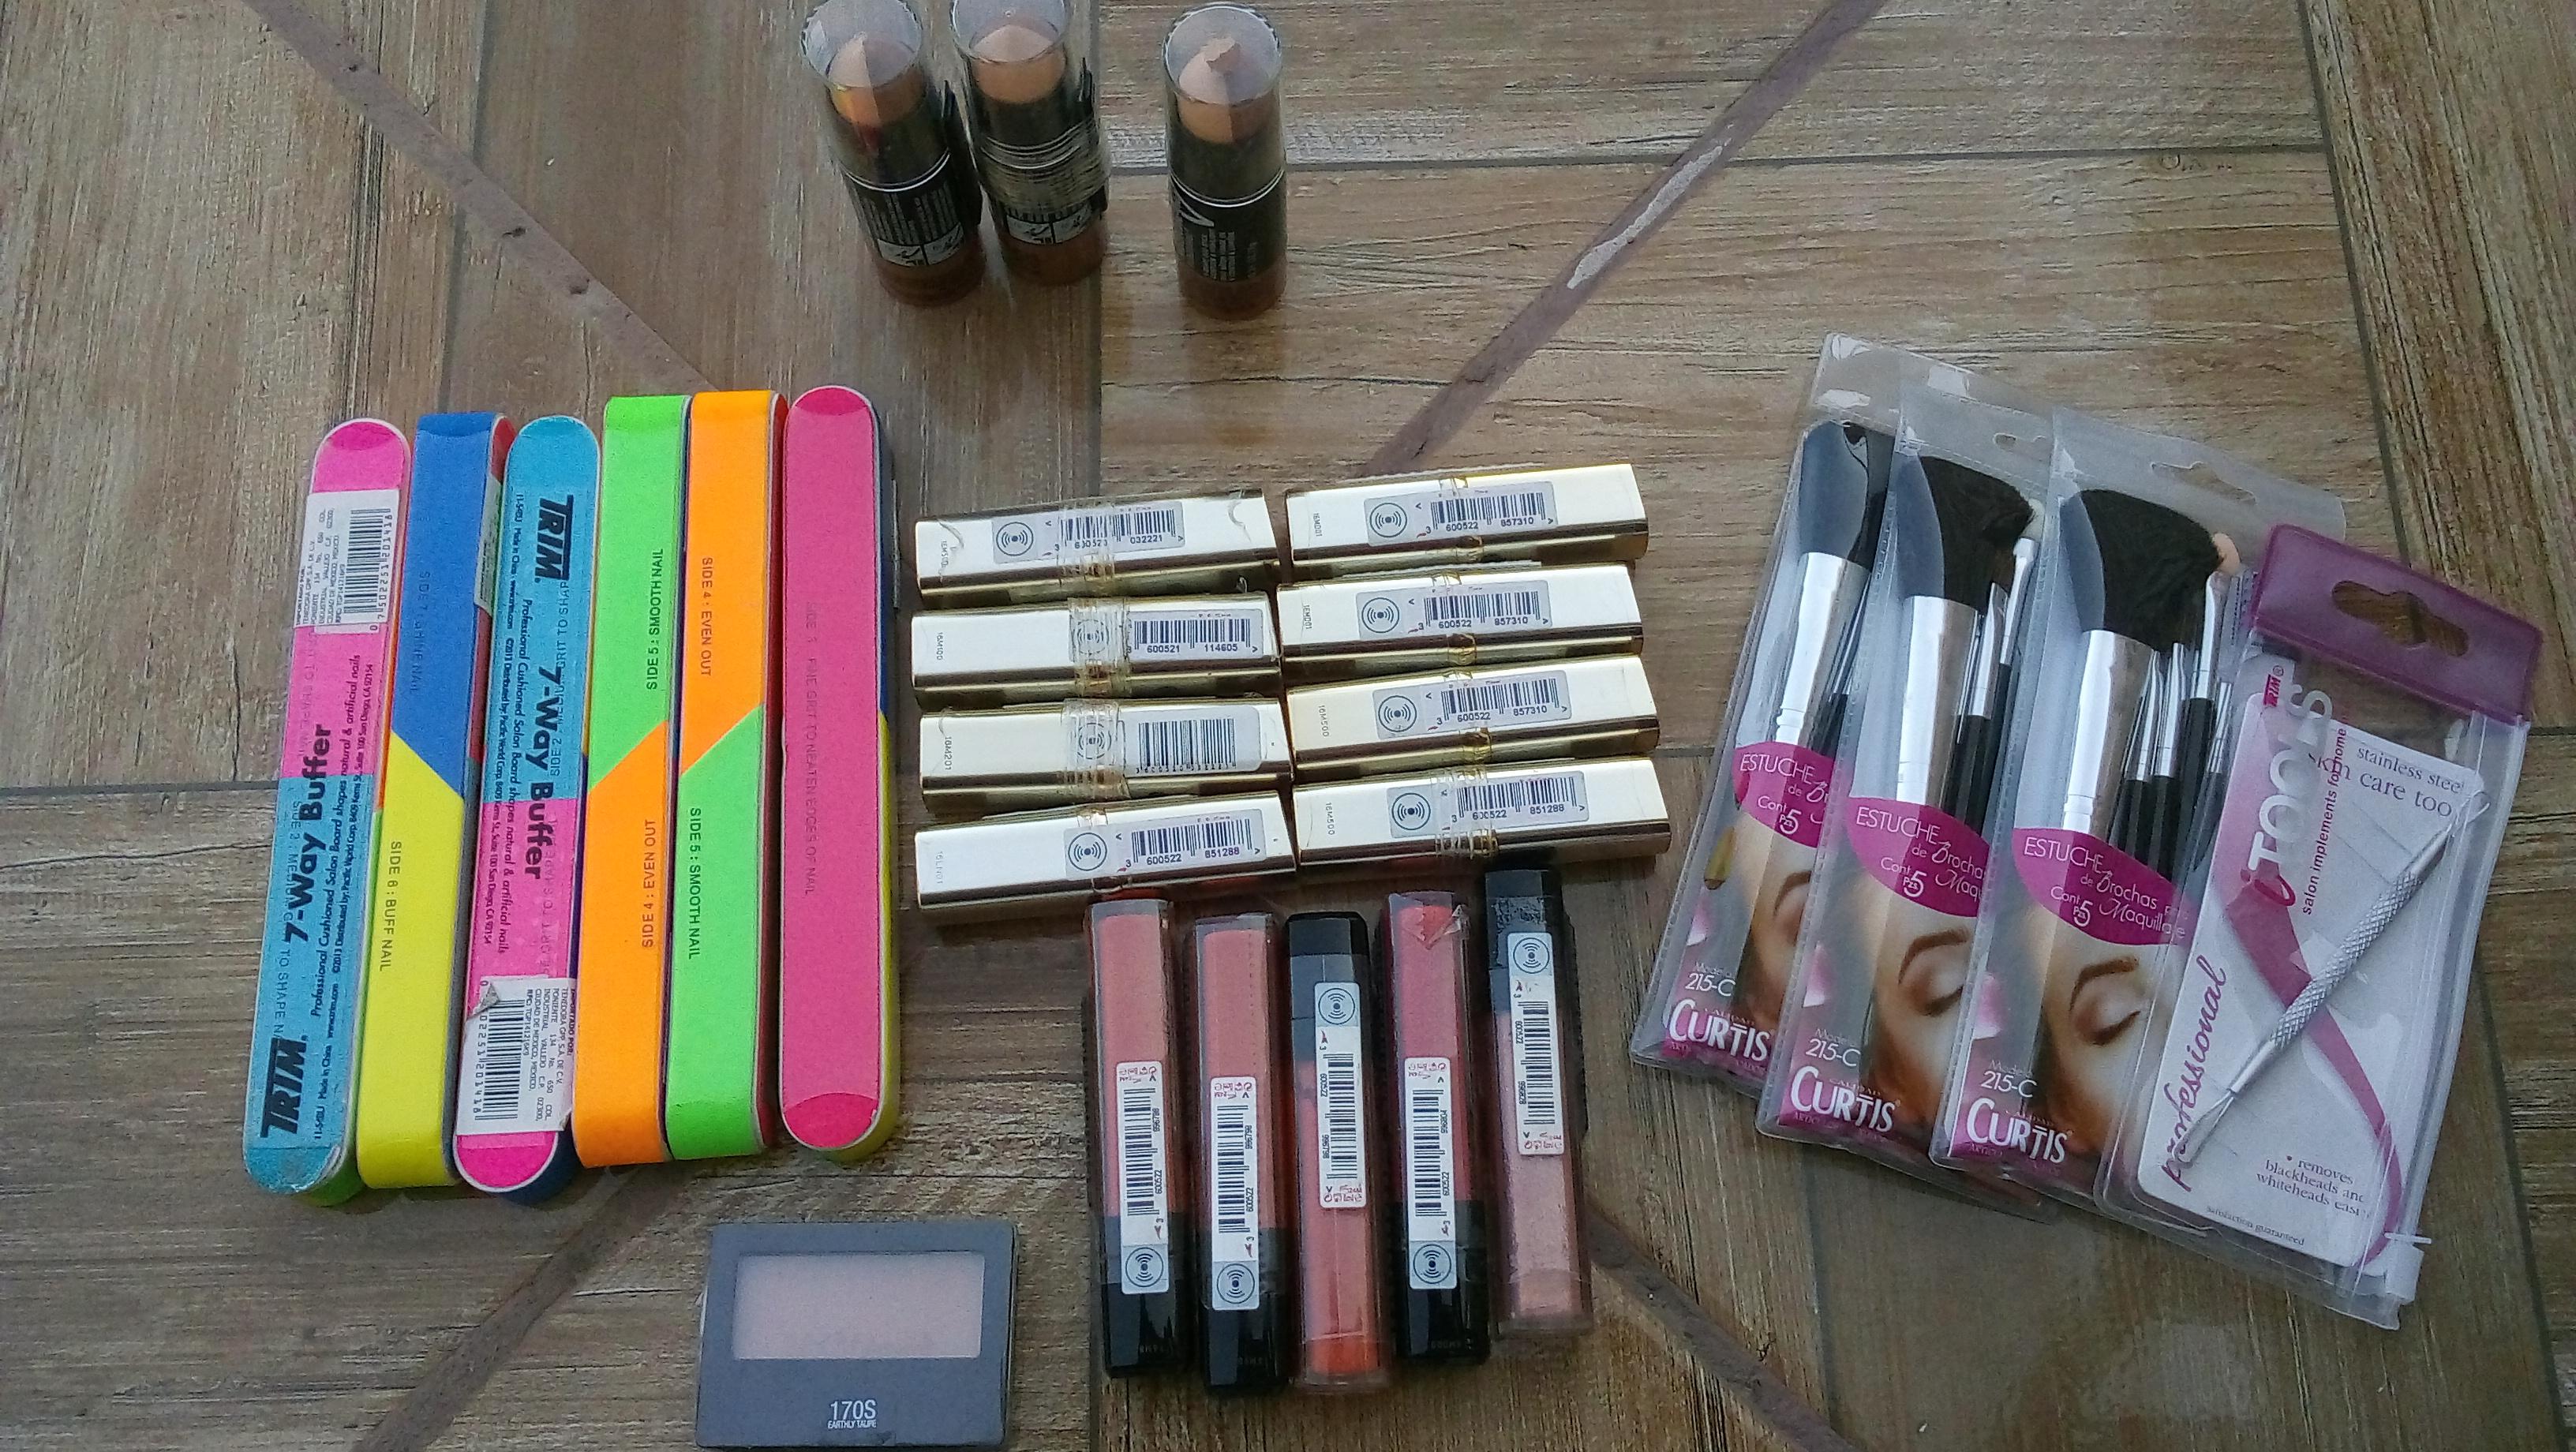 Chedraui tonala: Maquillajes maebelline 3.00 con promonovela